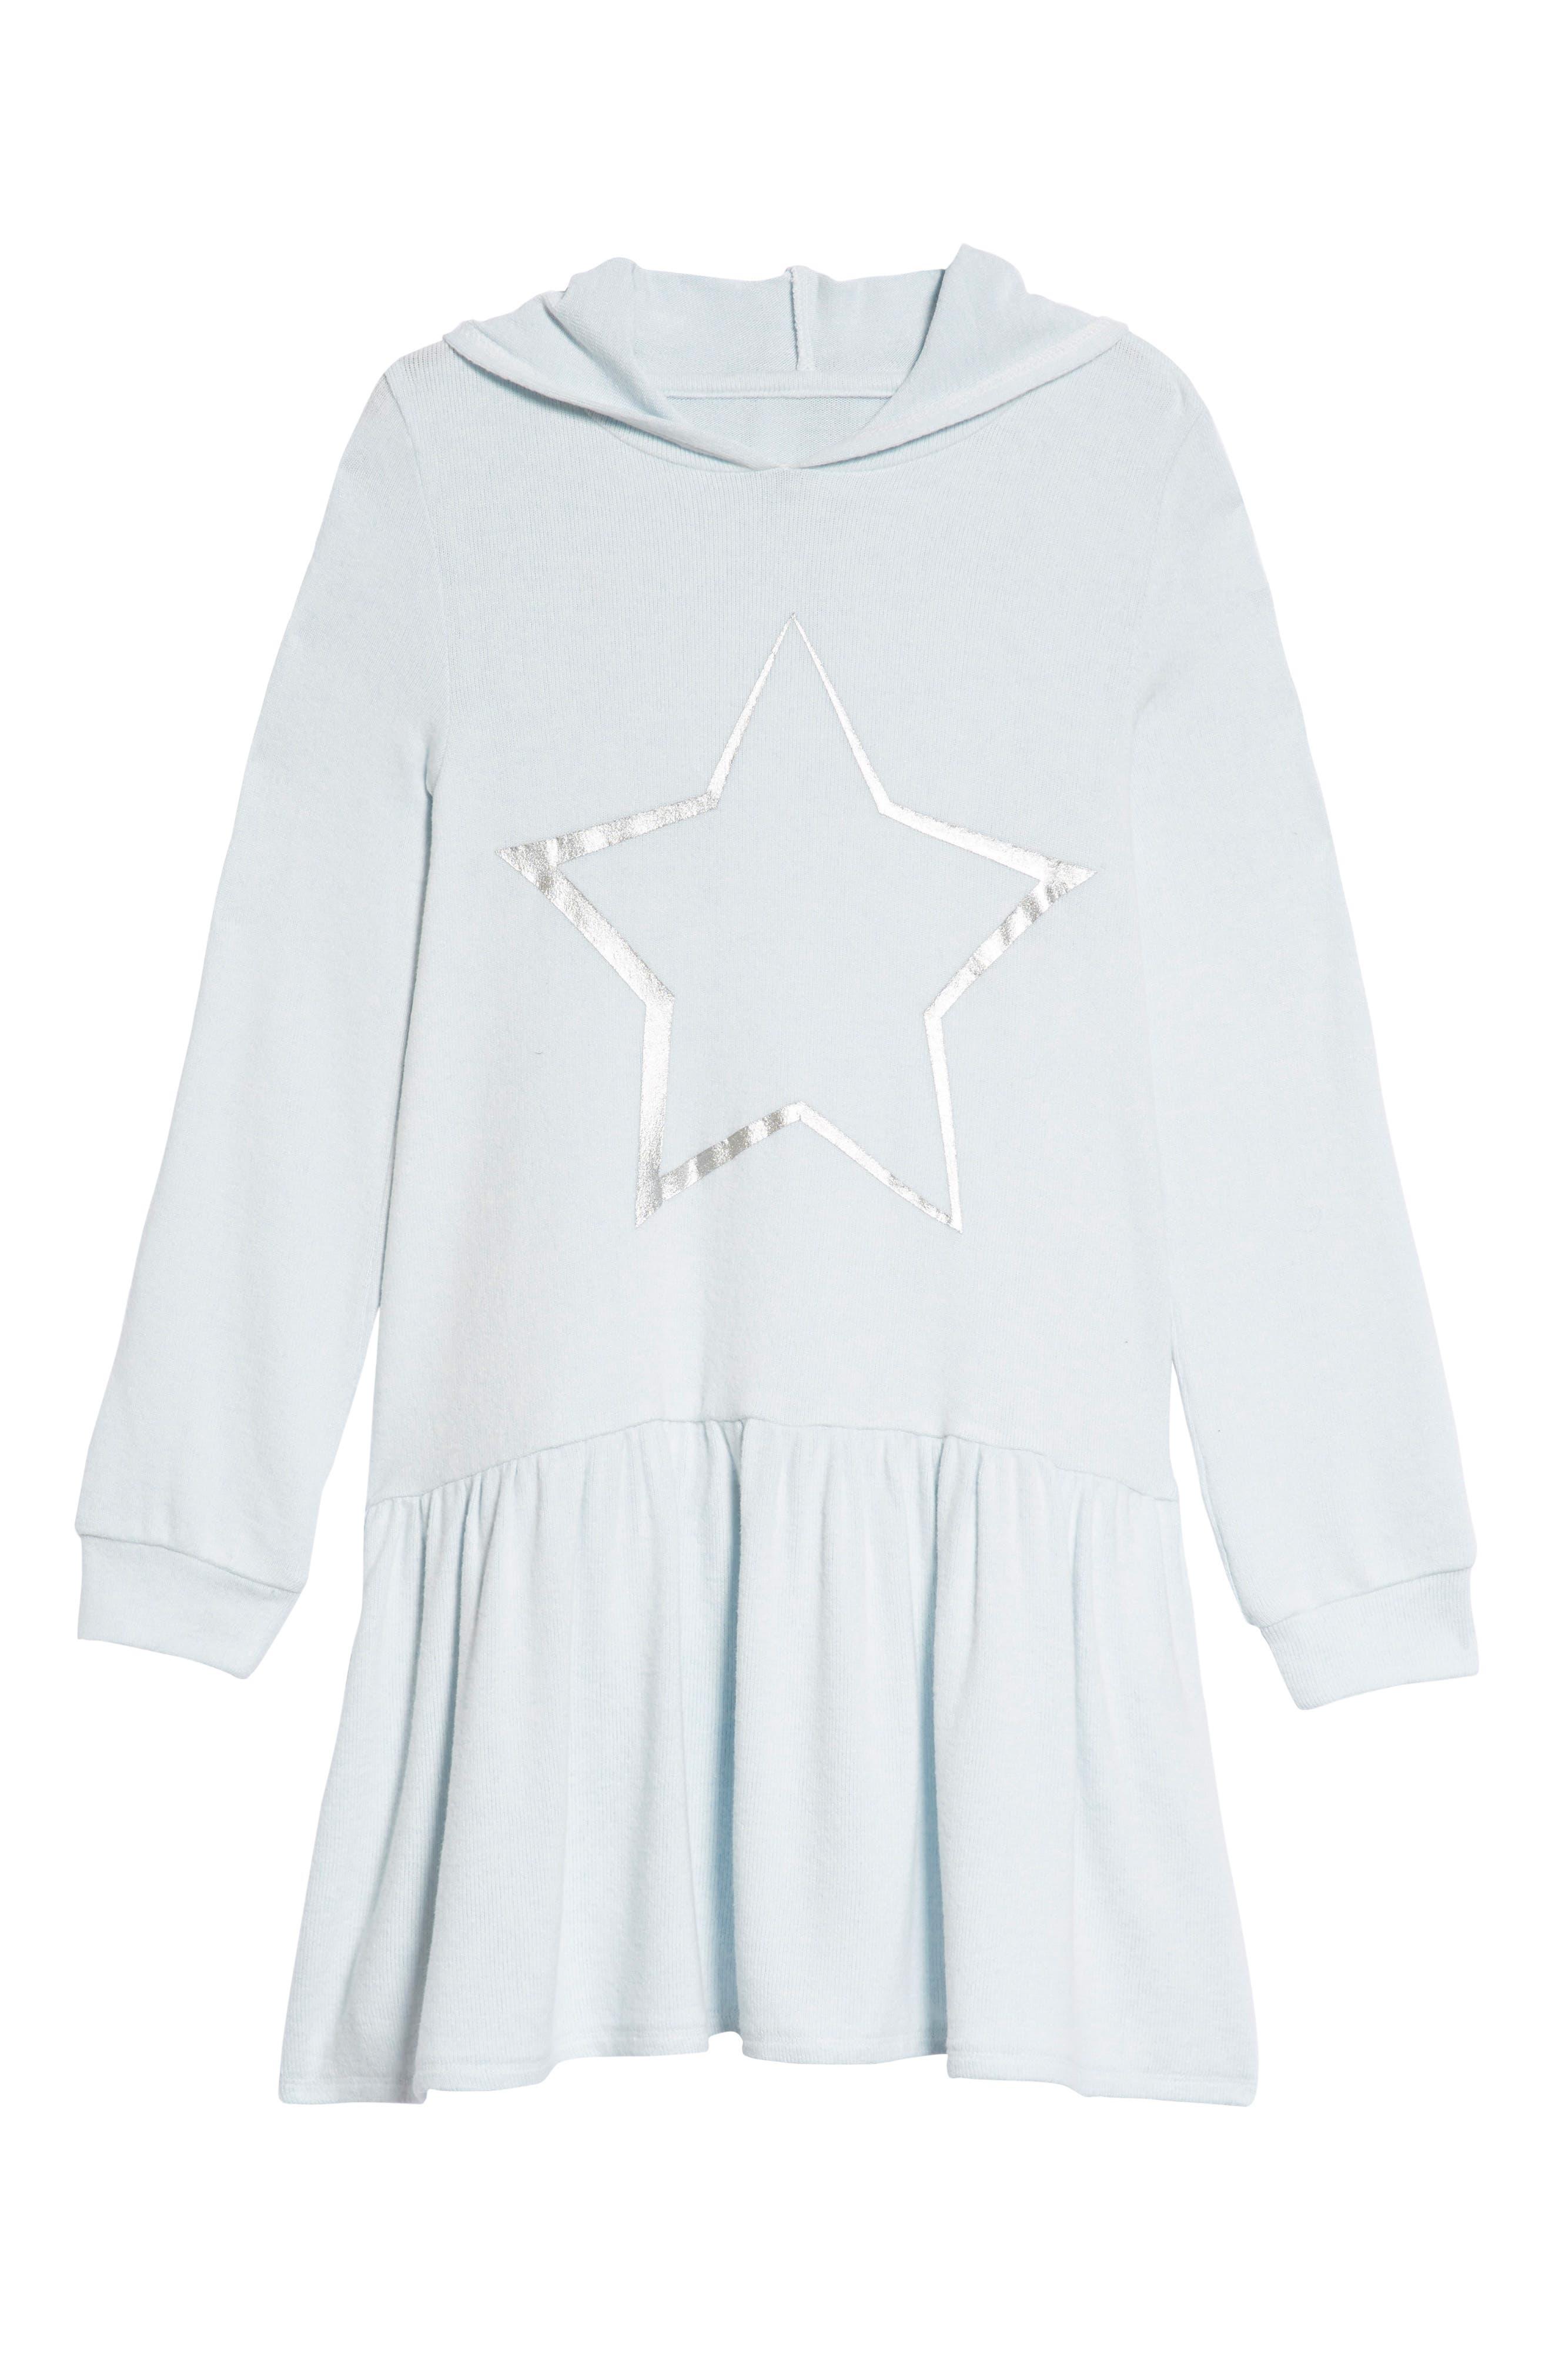 Cozy Hooded Dress,                         Main,                         color, Blue Drift Star